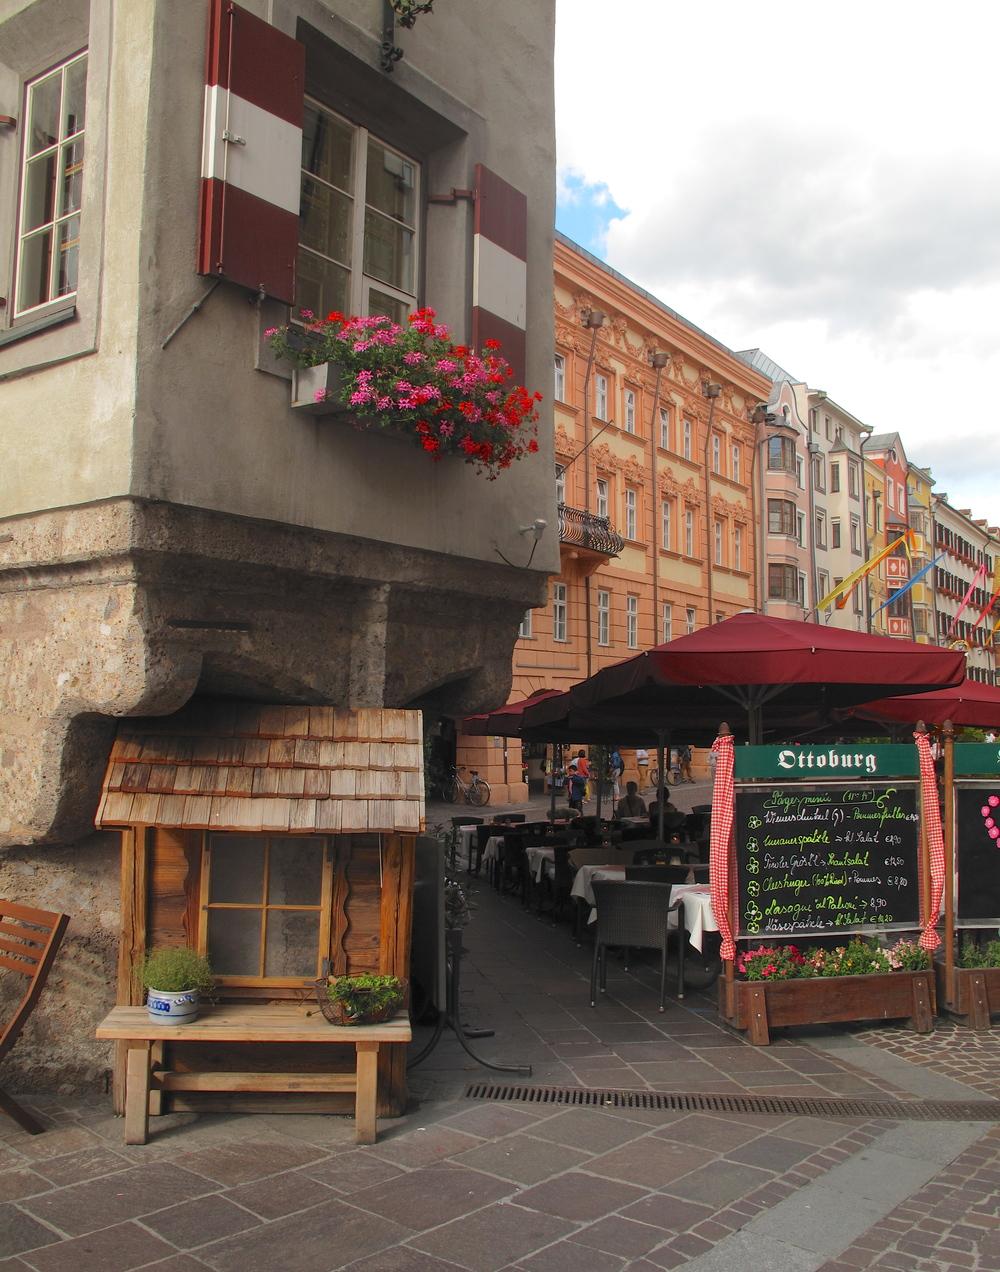 Innsbruck restaurant awnings, Austria